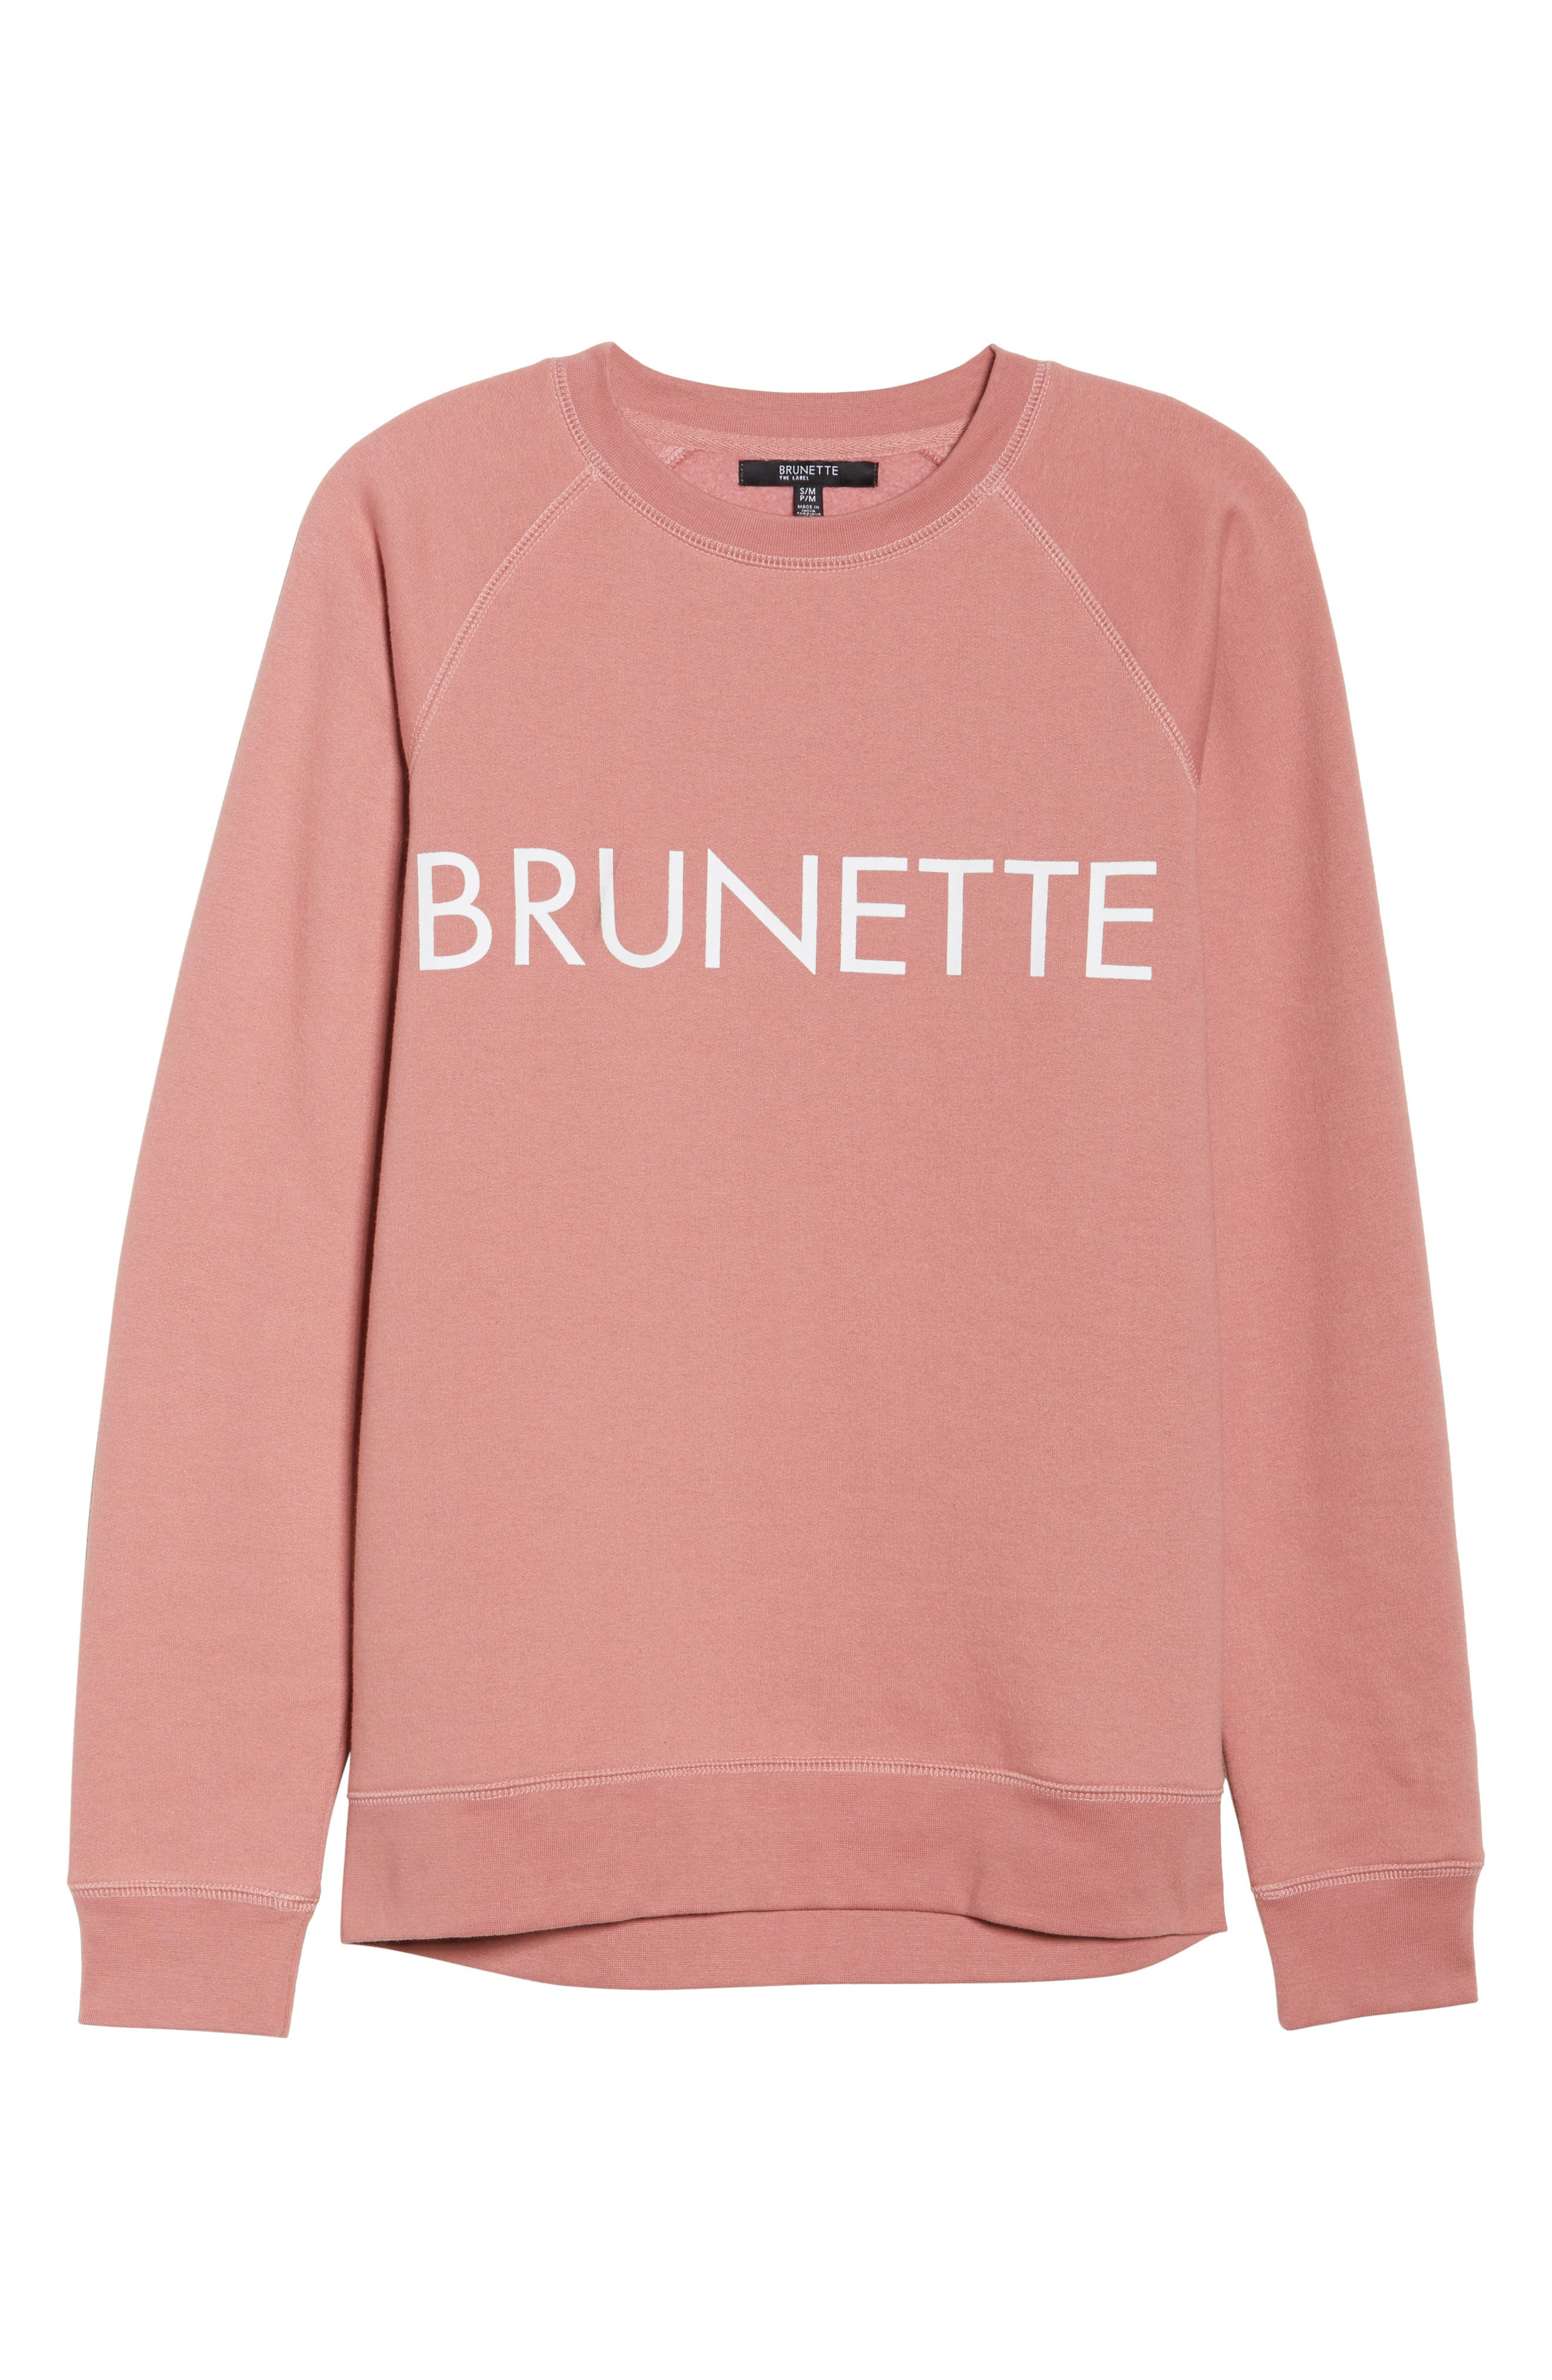 Brunette Crewneck Sweatshirt,                             Alternate thumbnail 4, color,                             Dusty Rose